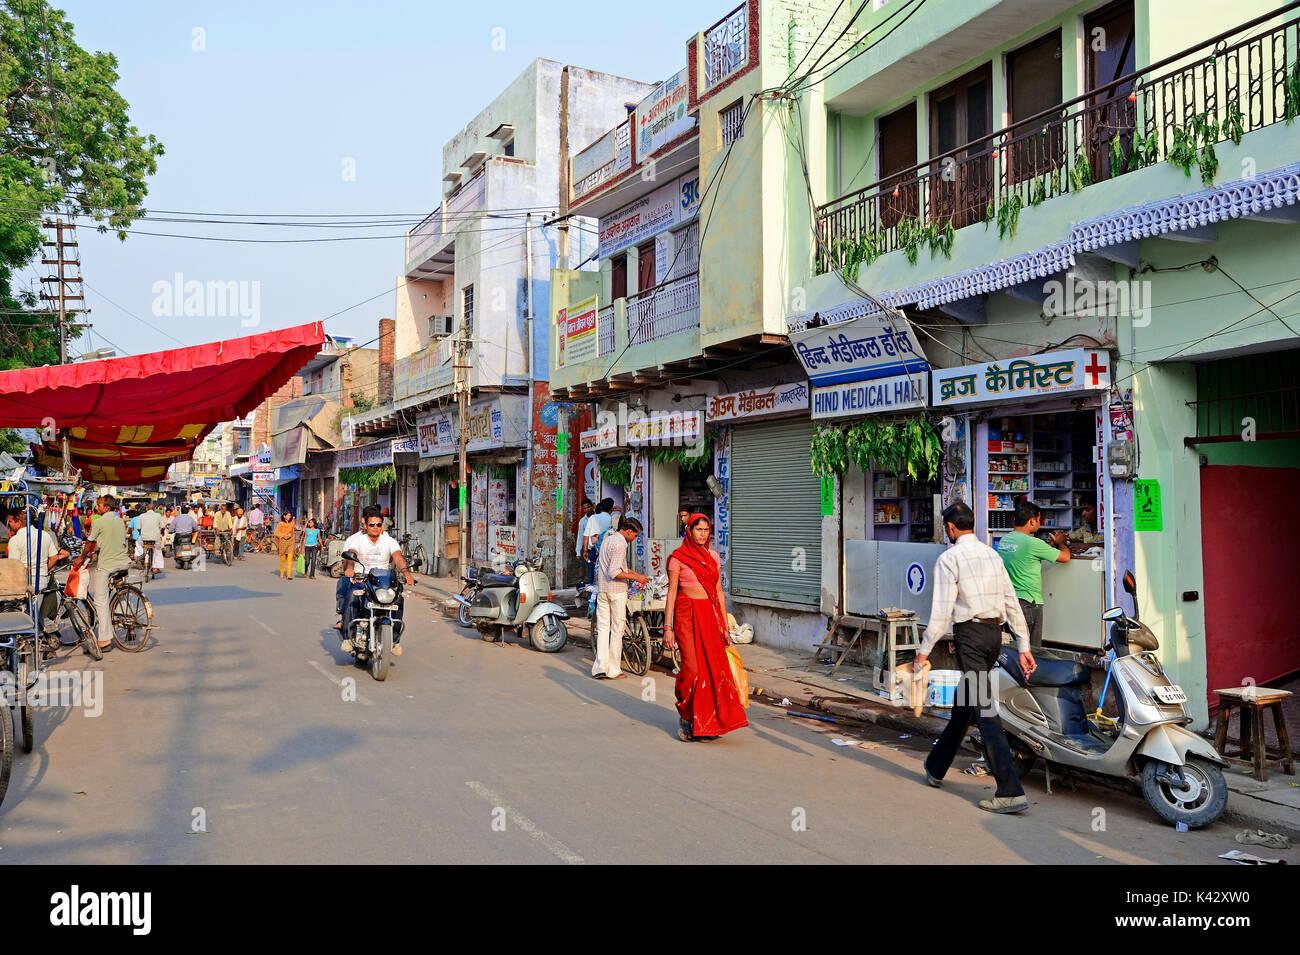 Shopping Street, Bharatpur, Rajasthan, Indien | Einkaufsstrasse, Bharatpur, Rajasthan, Indien Stockbild